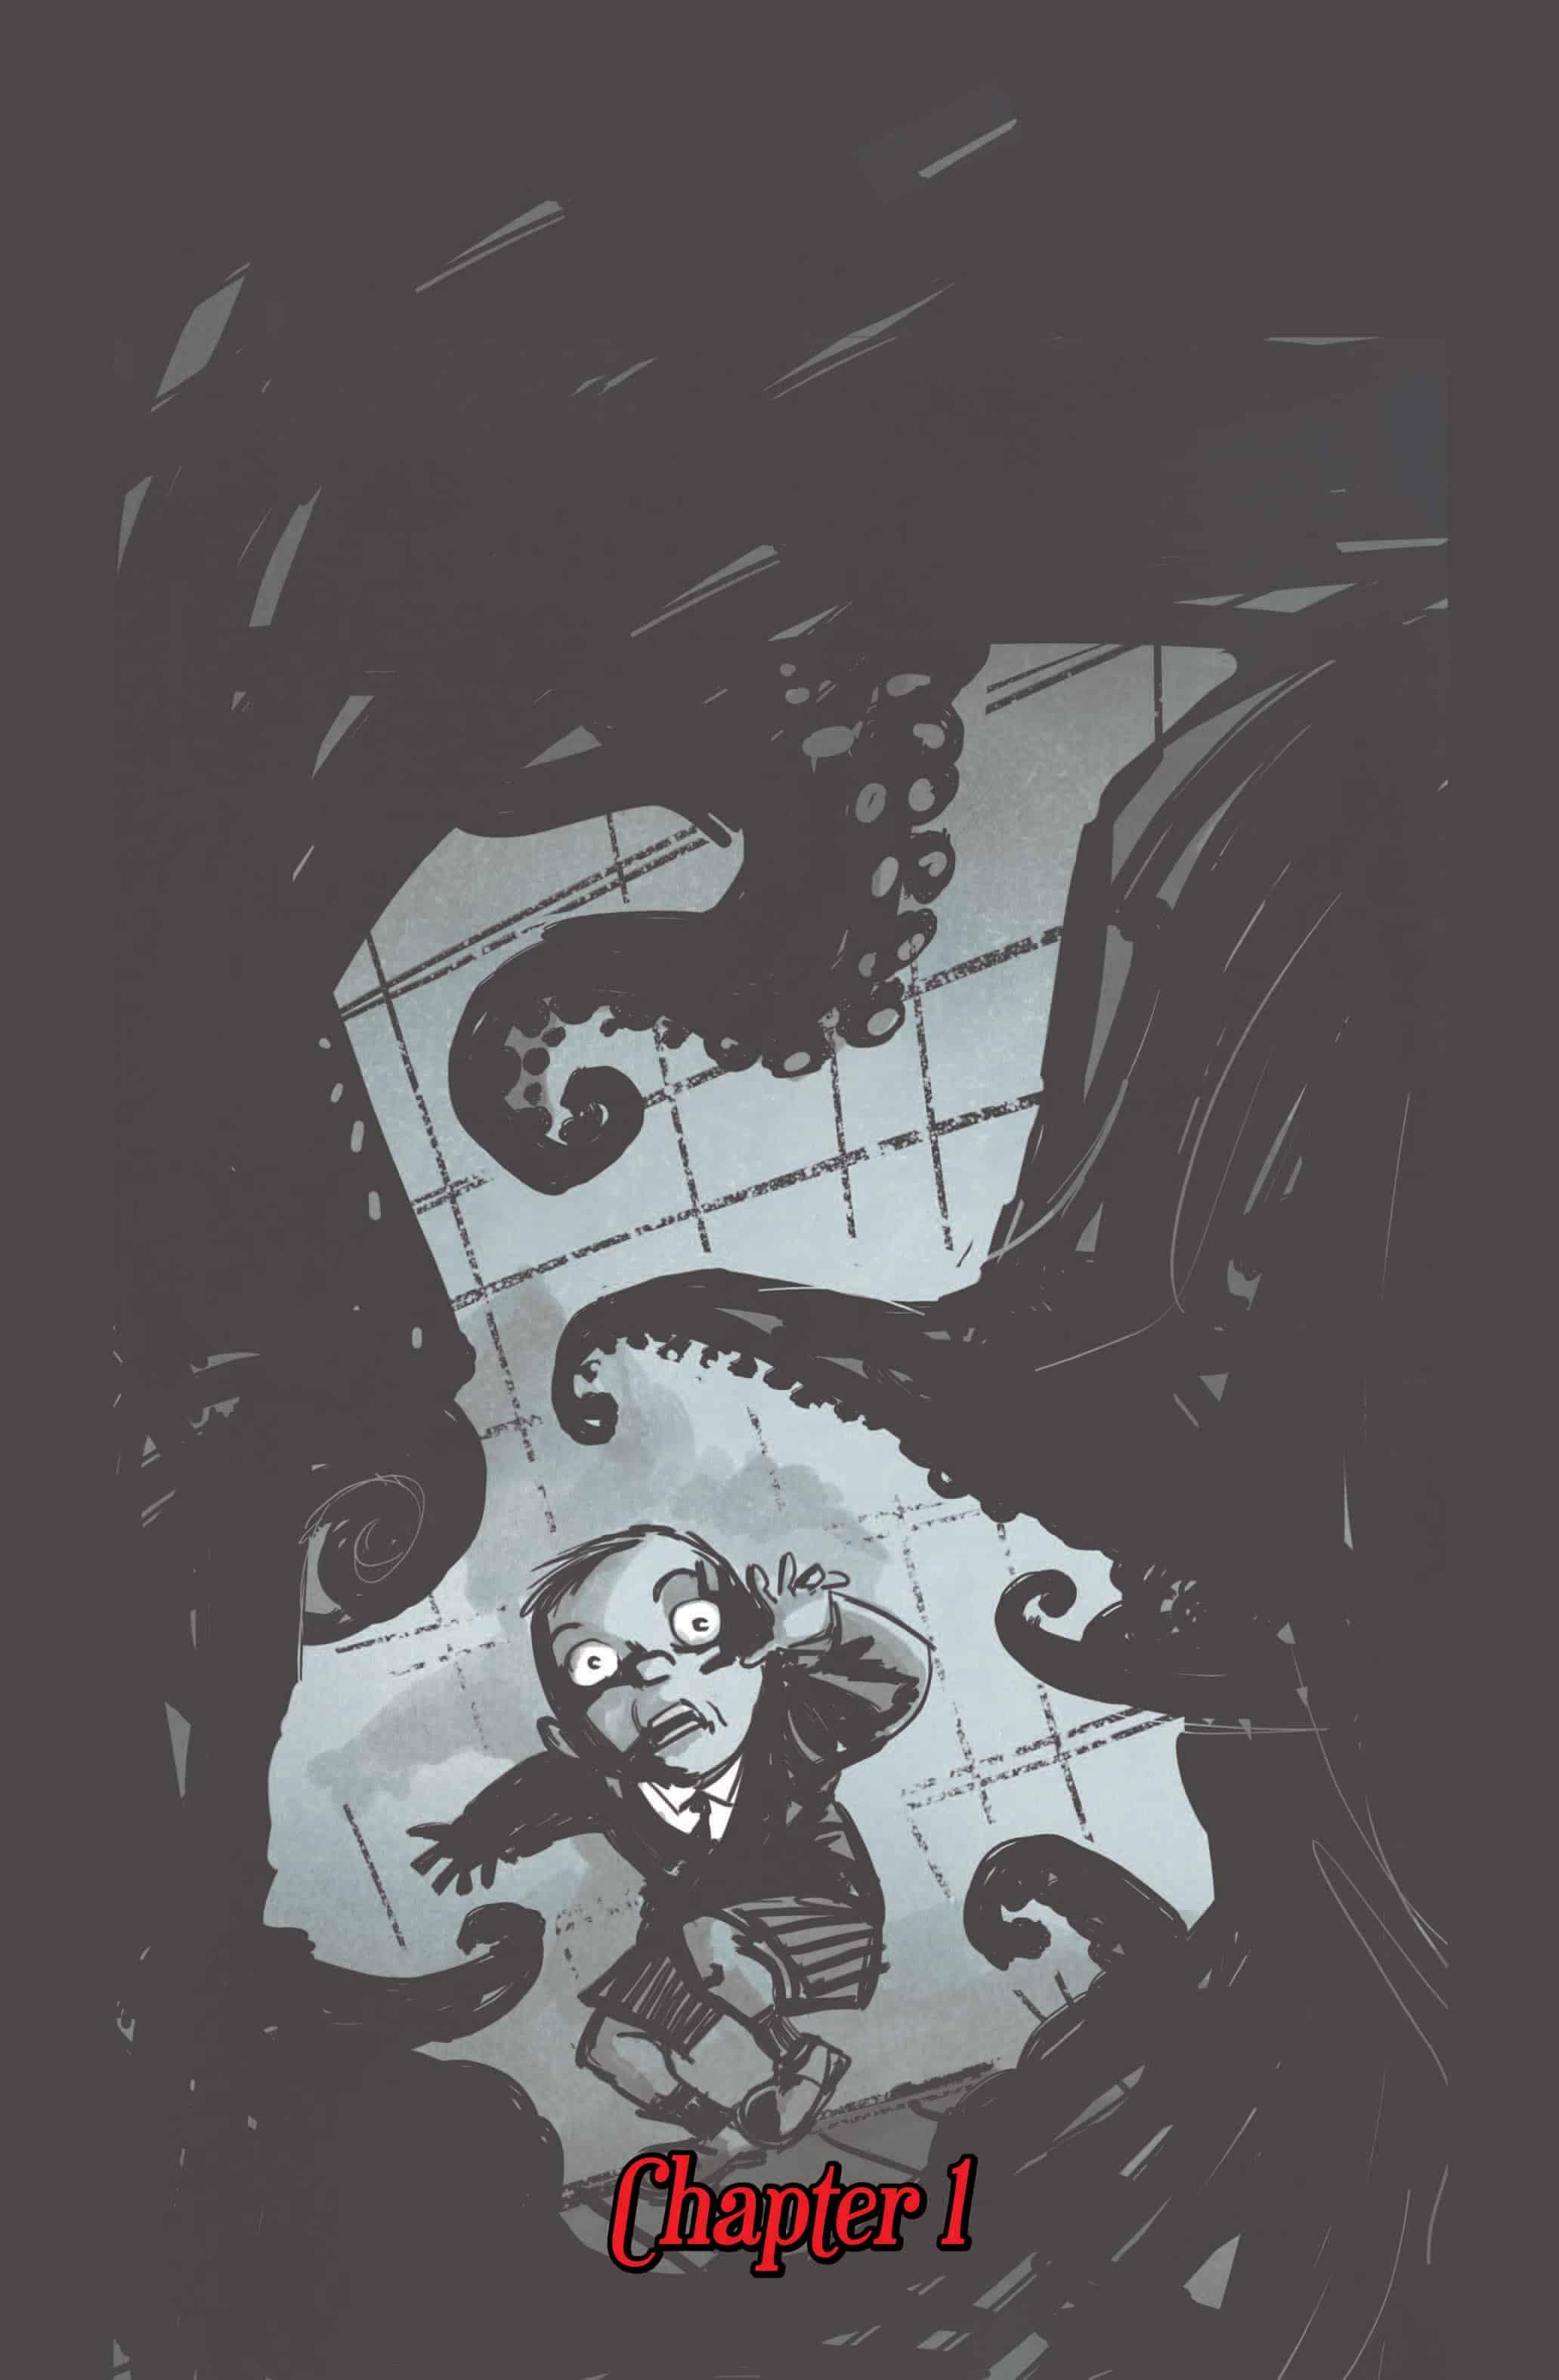 Howard_Lovecraft_Three_Kingdoms-300dpi-154